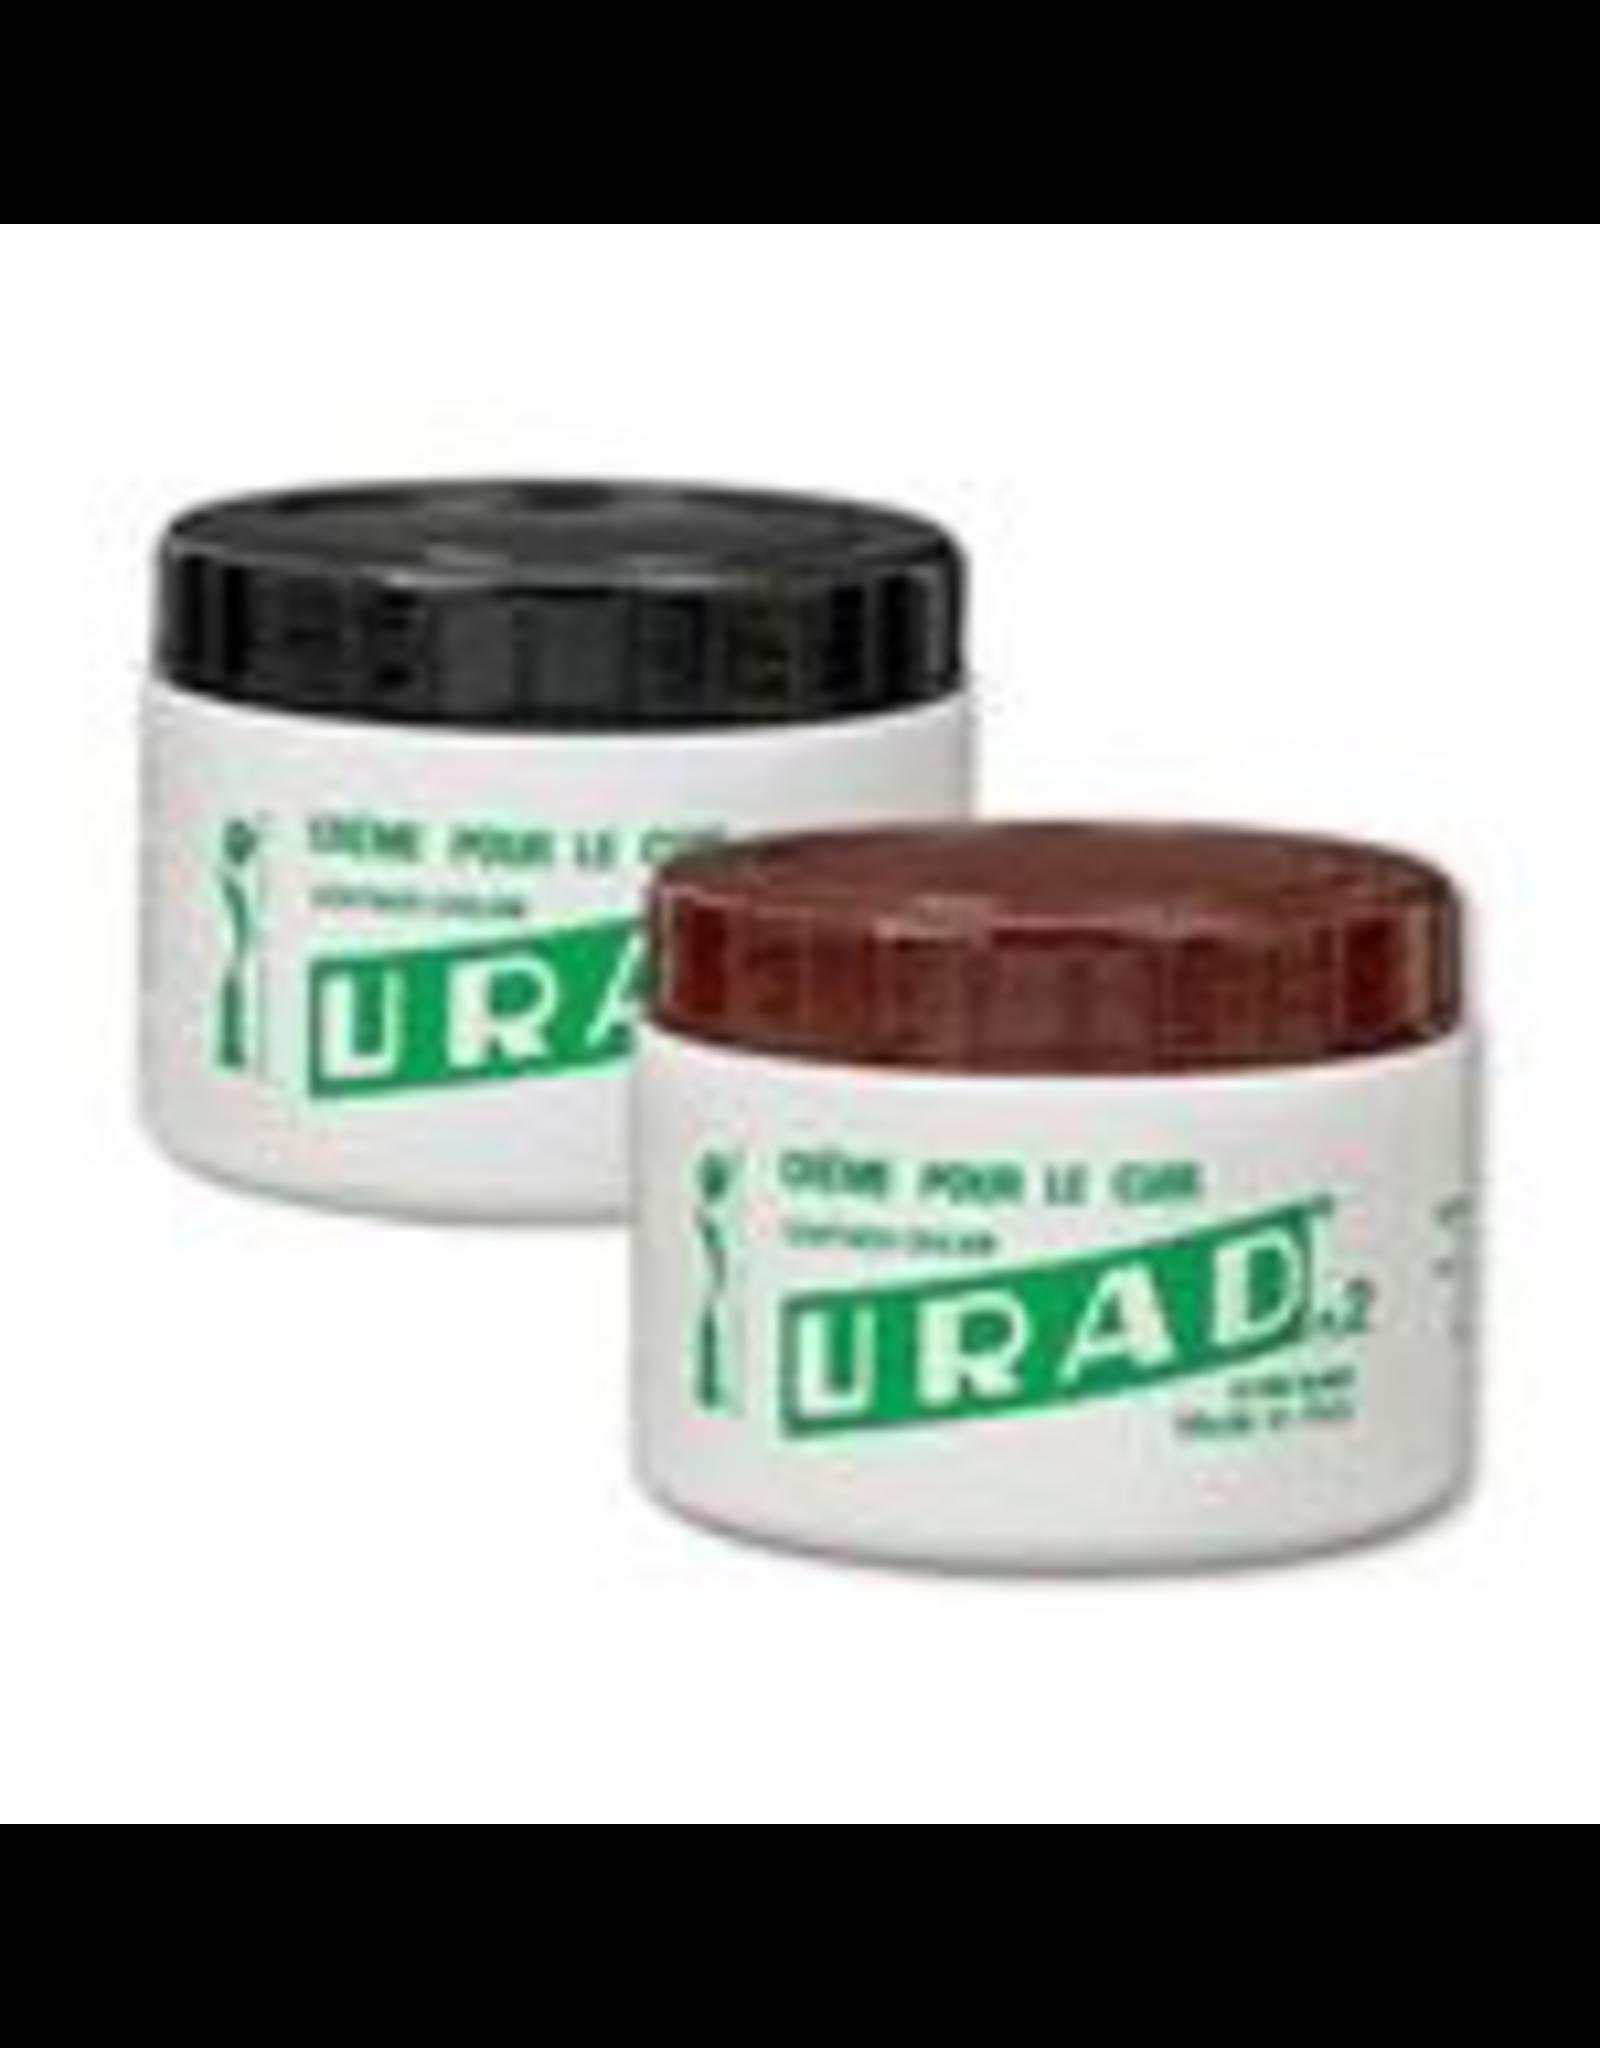 Boot Care Products URAD Conditioner